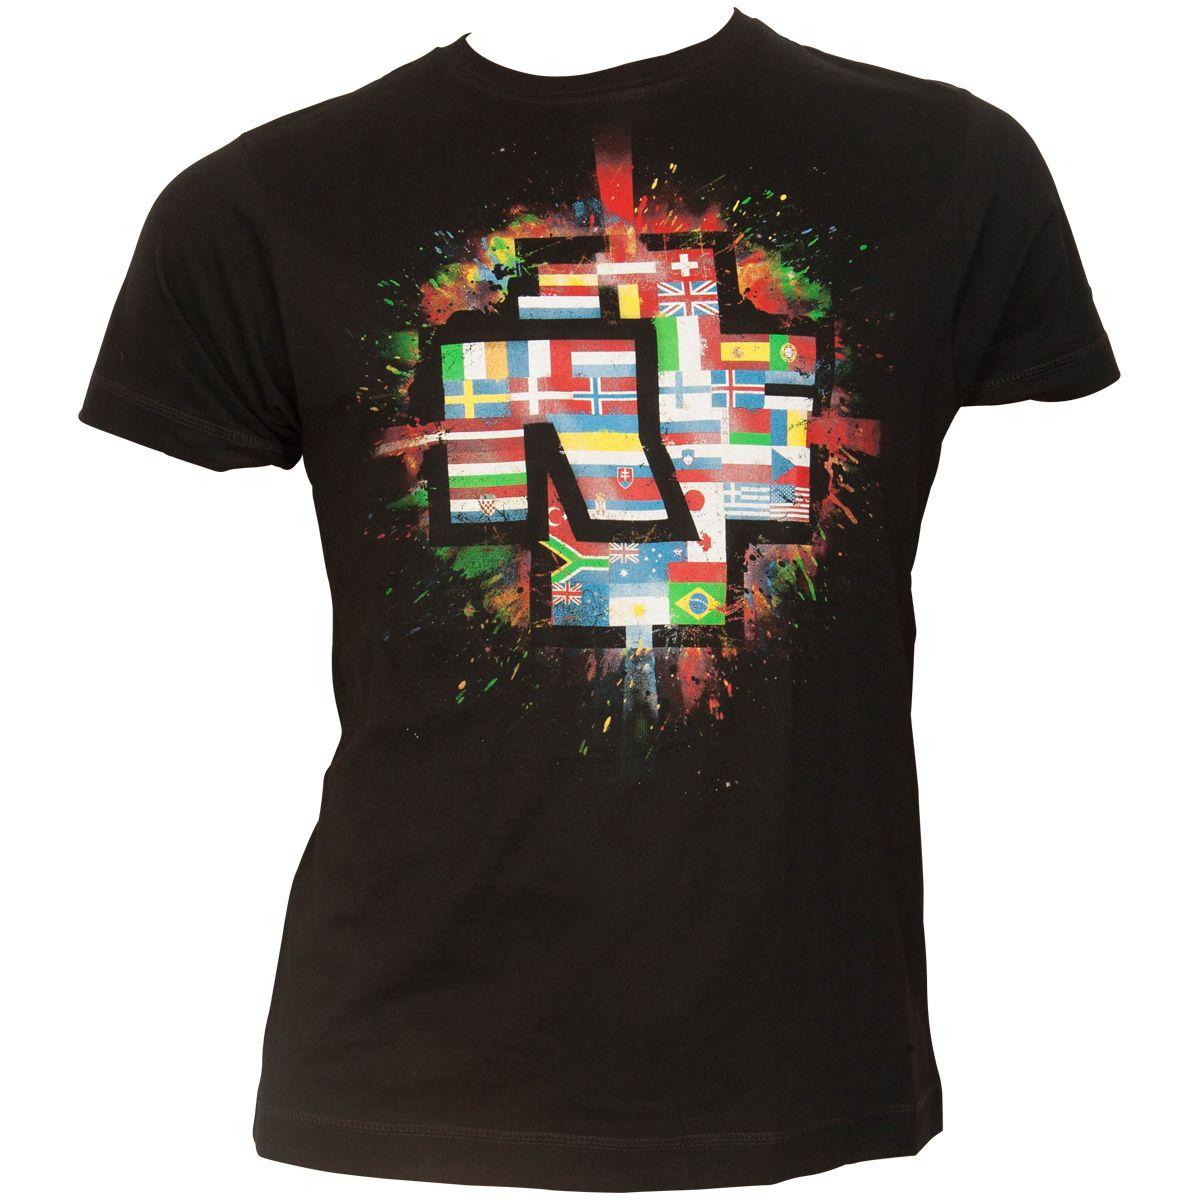 Rammstein - T-Shirt Flaggen - schwarz